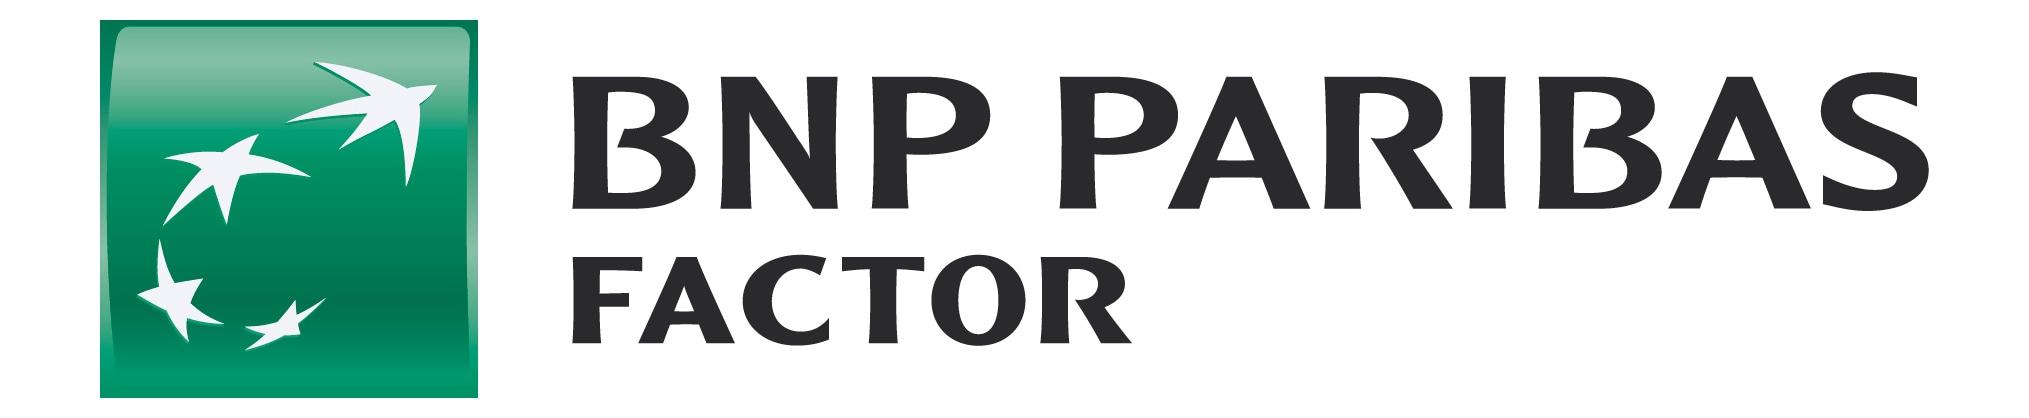 BNP Paribas Factor